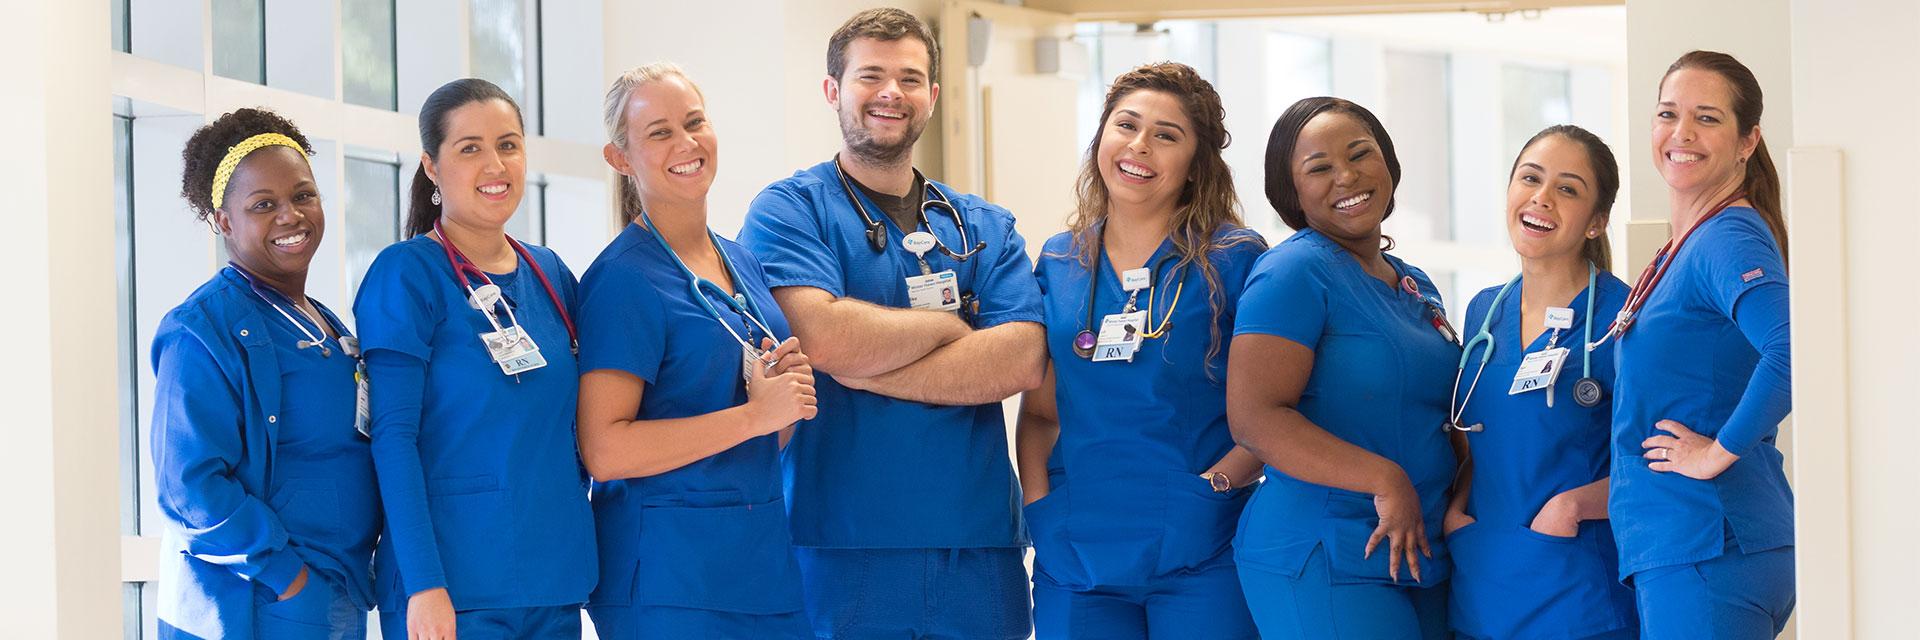 BayCare Health System - Choice Benefits